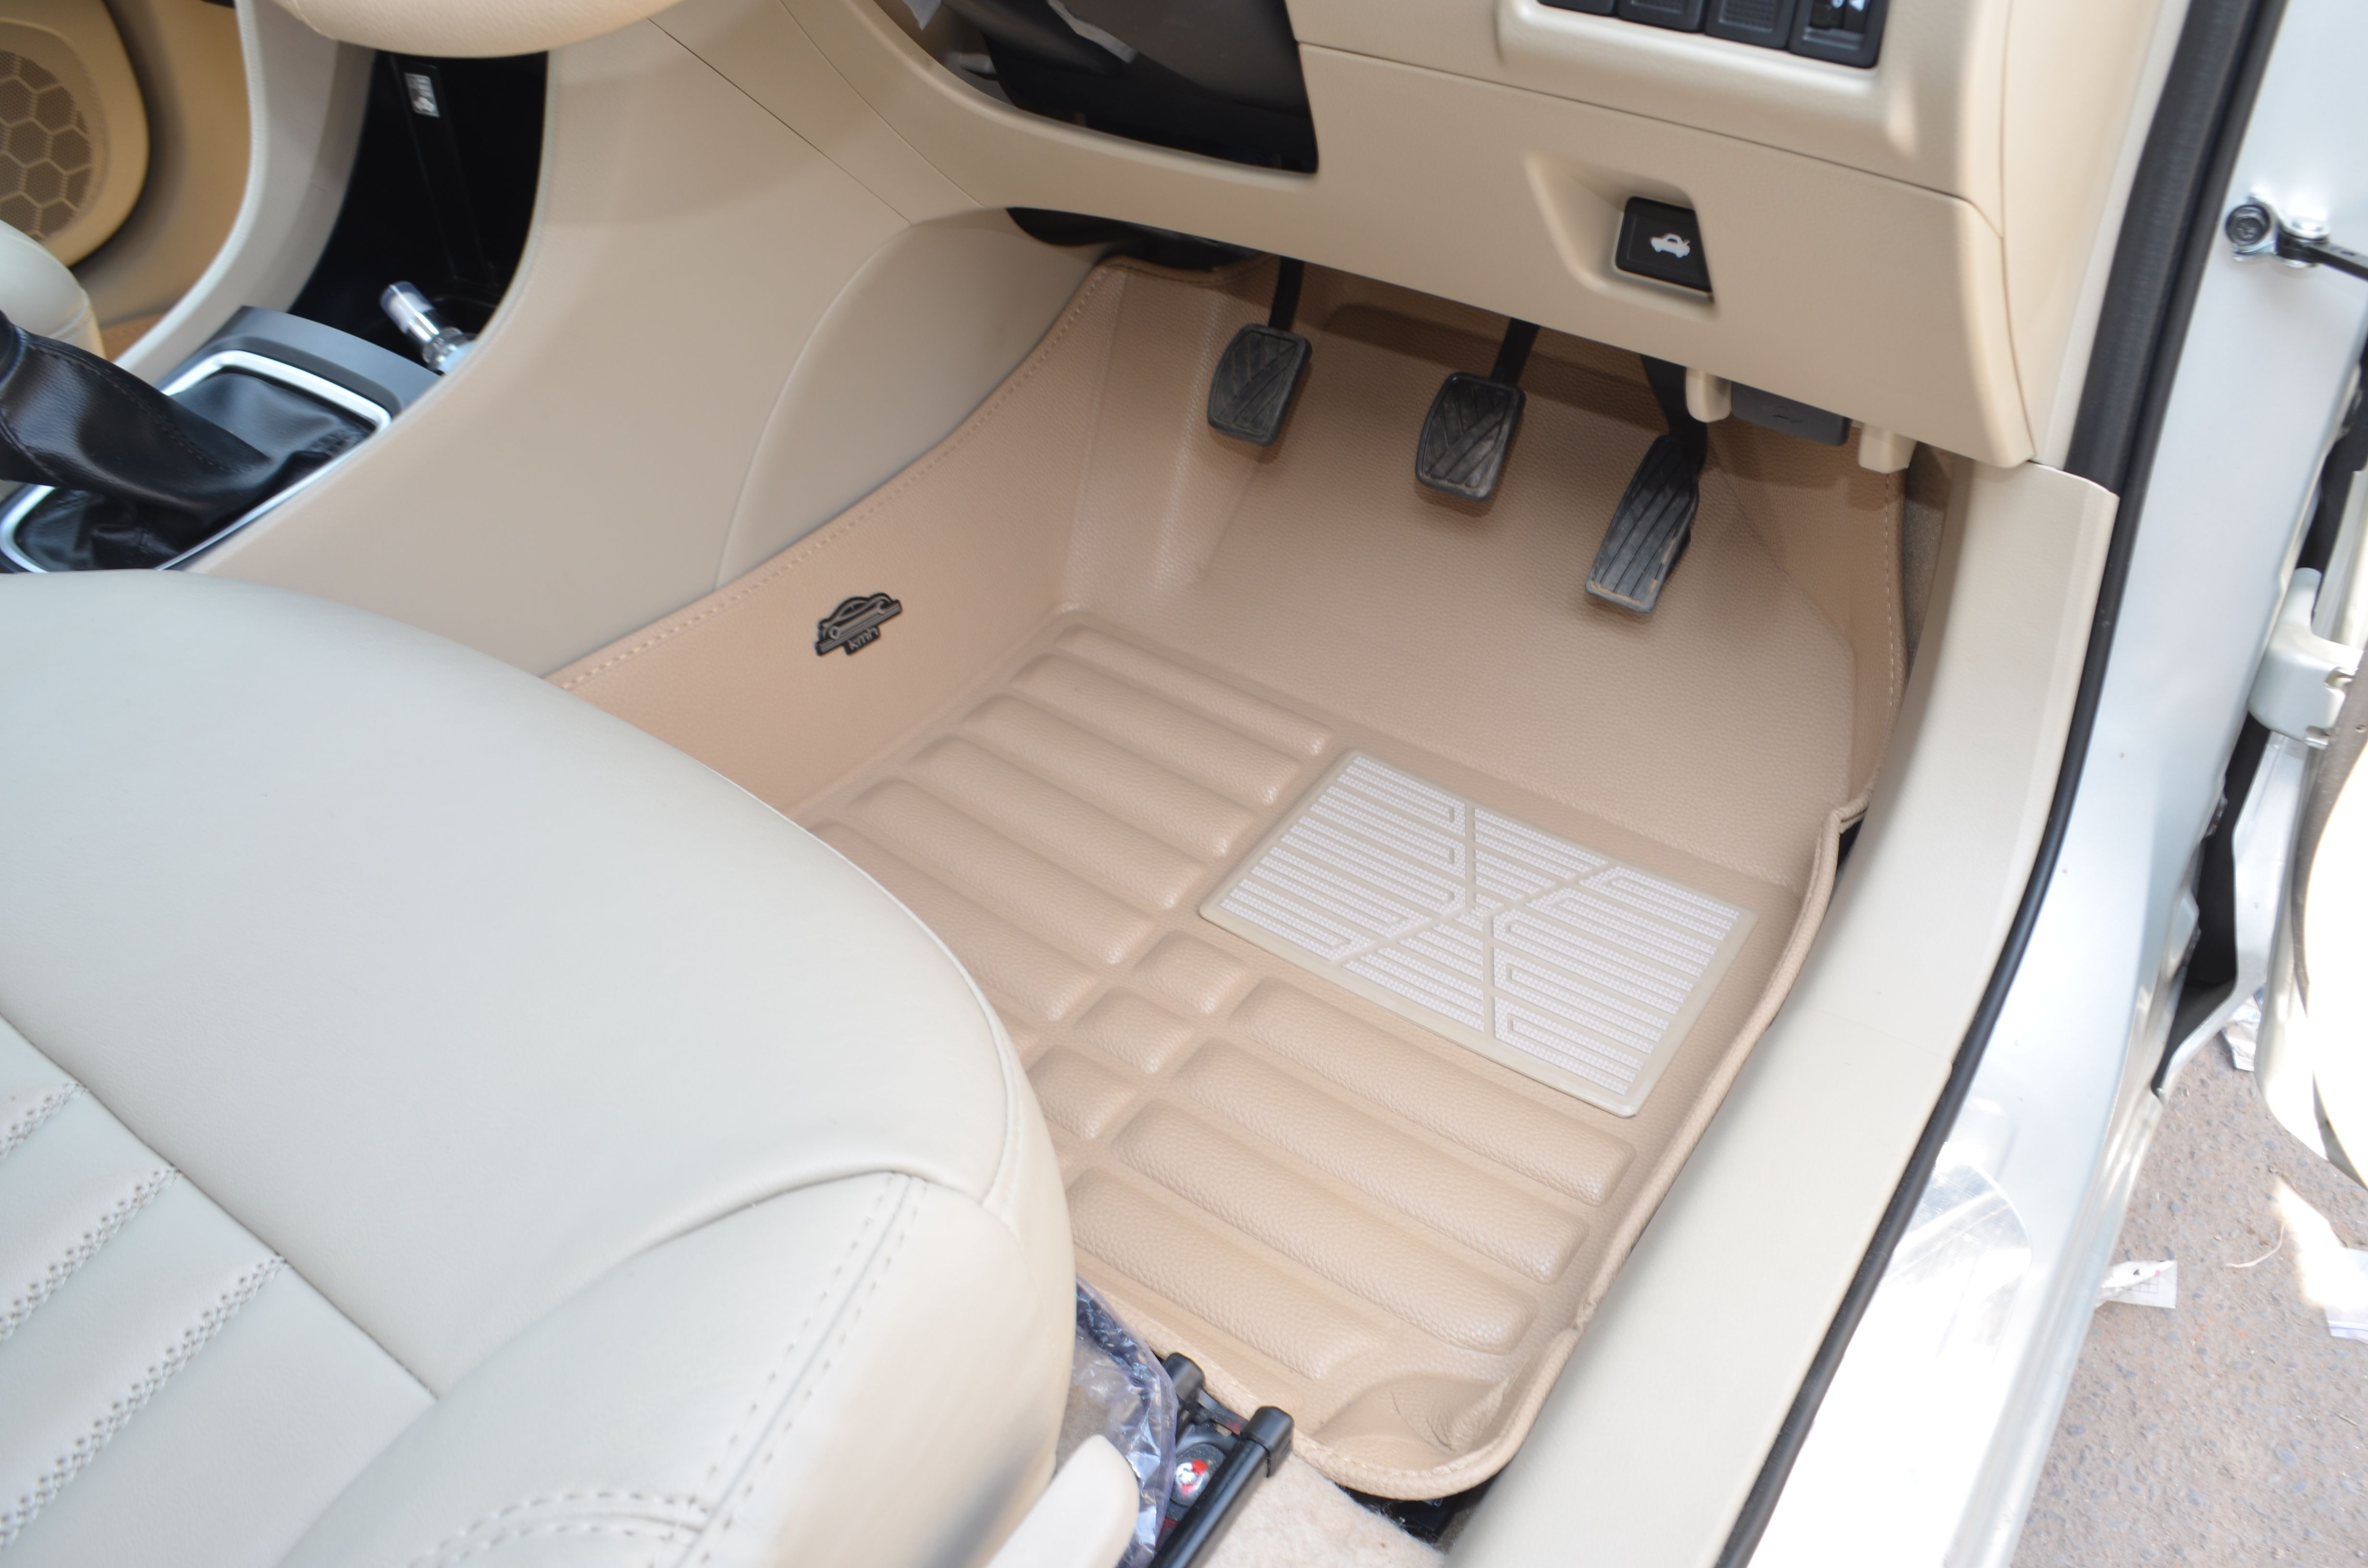 Kmh 5d Mat Fitted In Maruti Suzuki Ciaz Beige Colour Caraccessoriesonline Carfloormats Car Buying Tips Car Buying Car